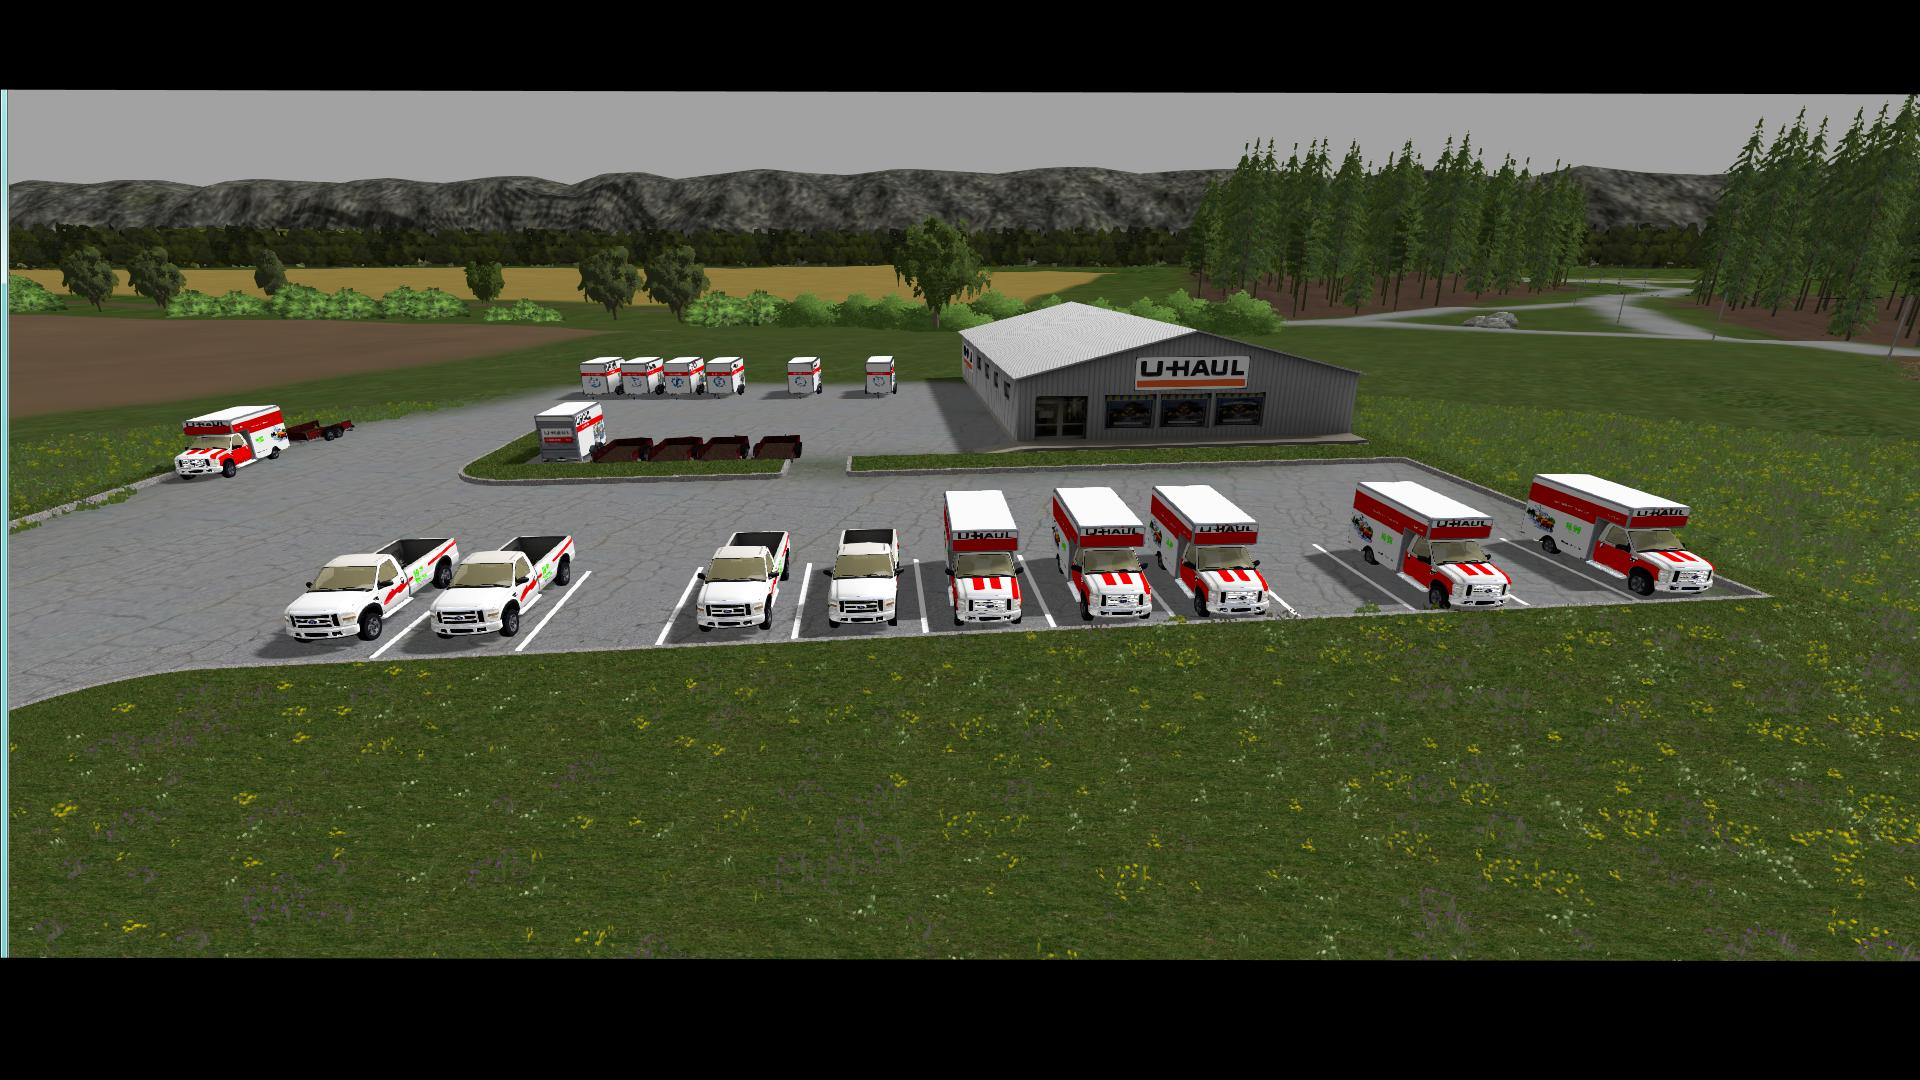 CSI DEERFIELD MAP V1 - Farming simulator 19 / 17 / 15 Mod